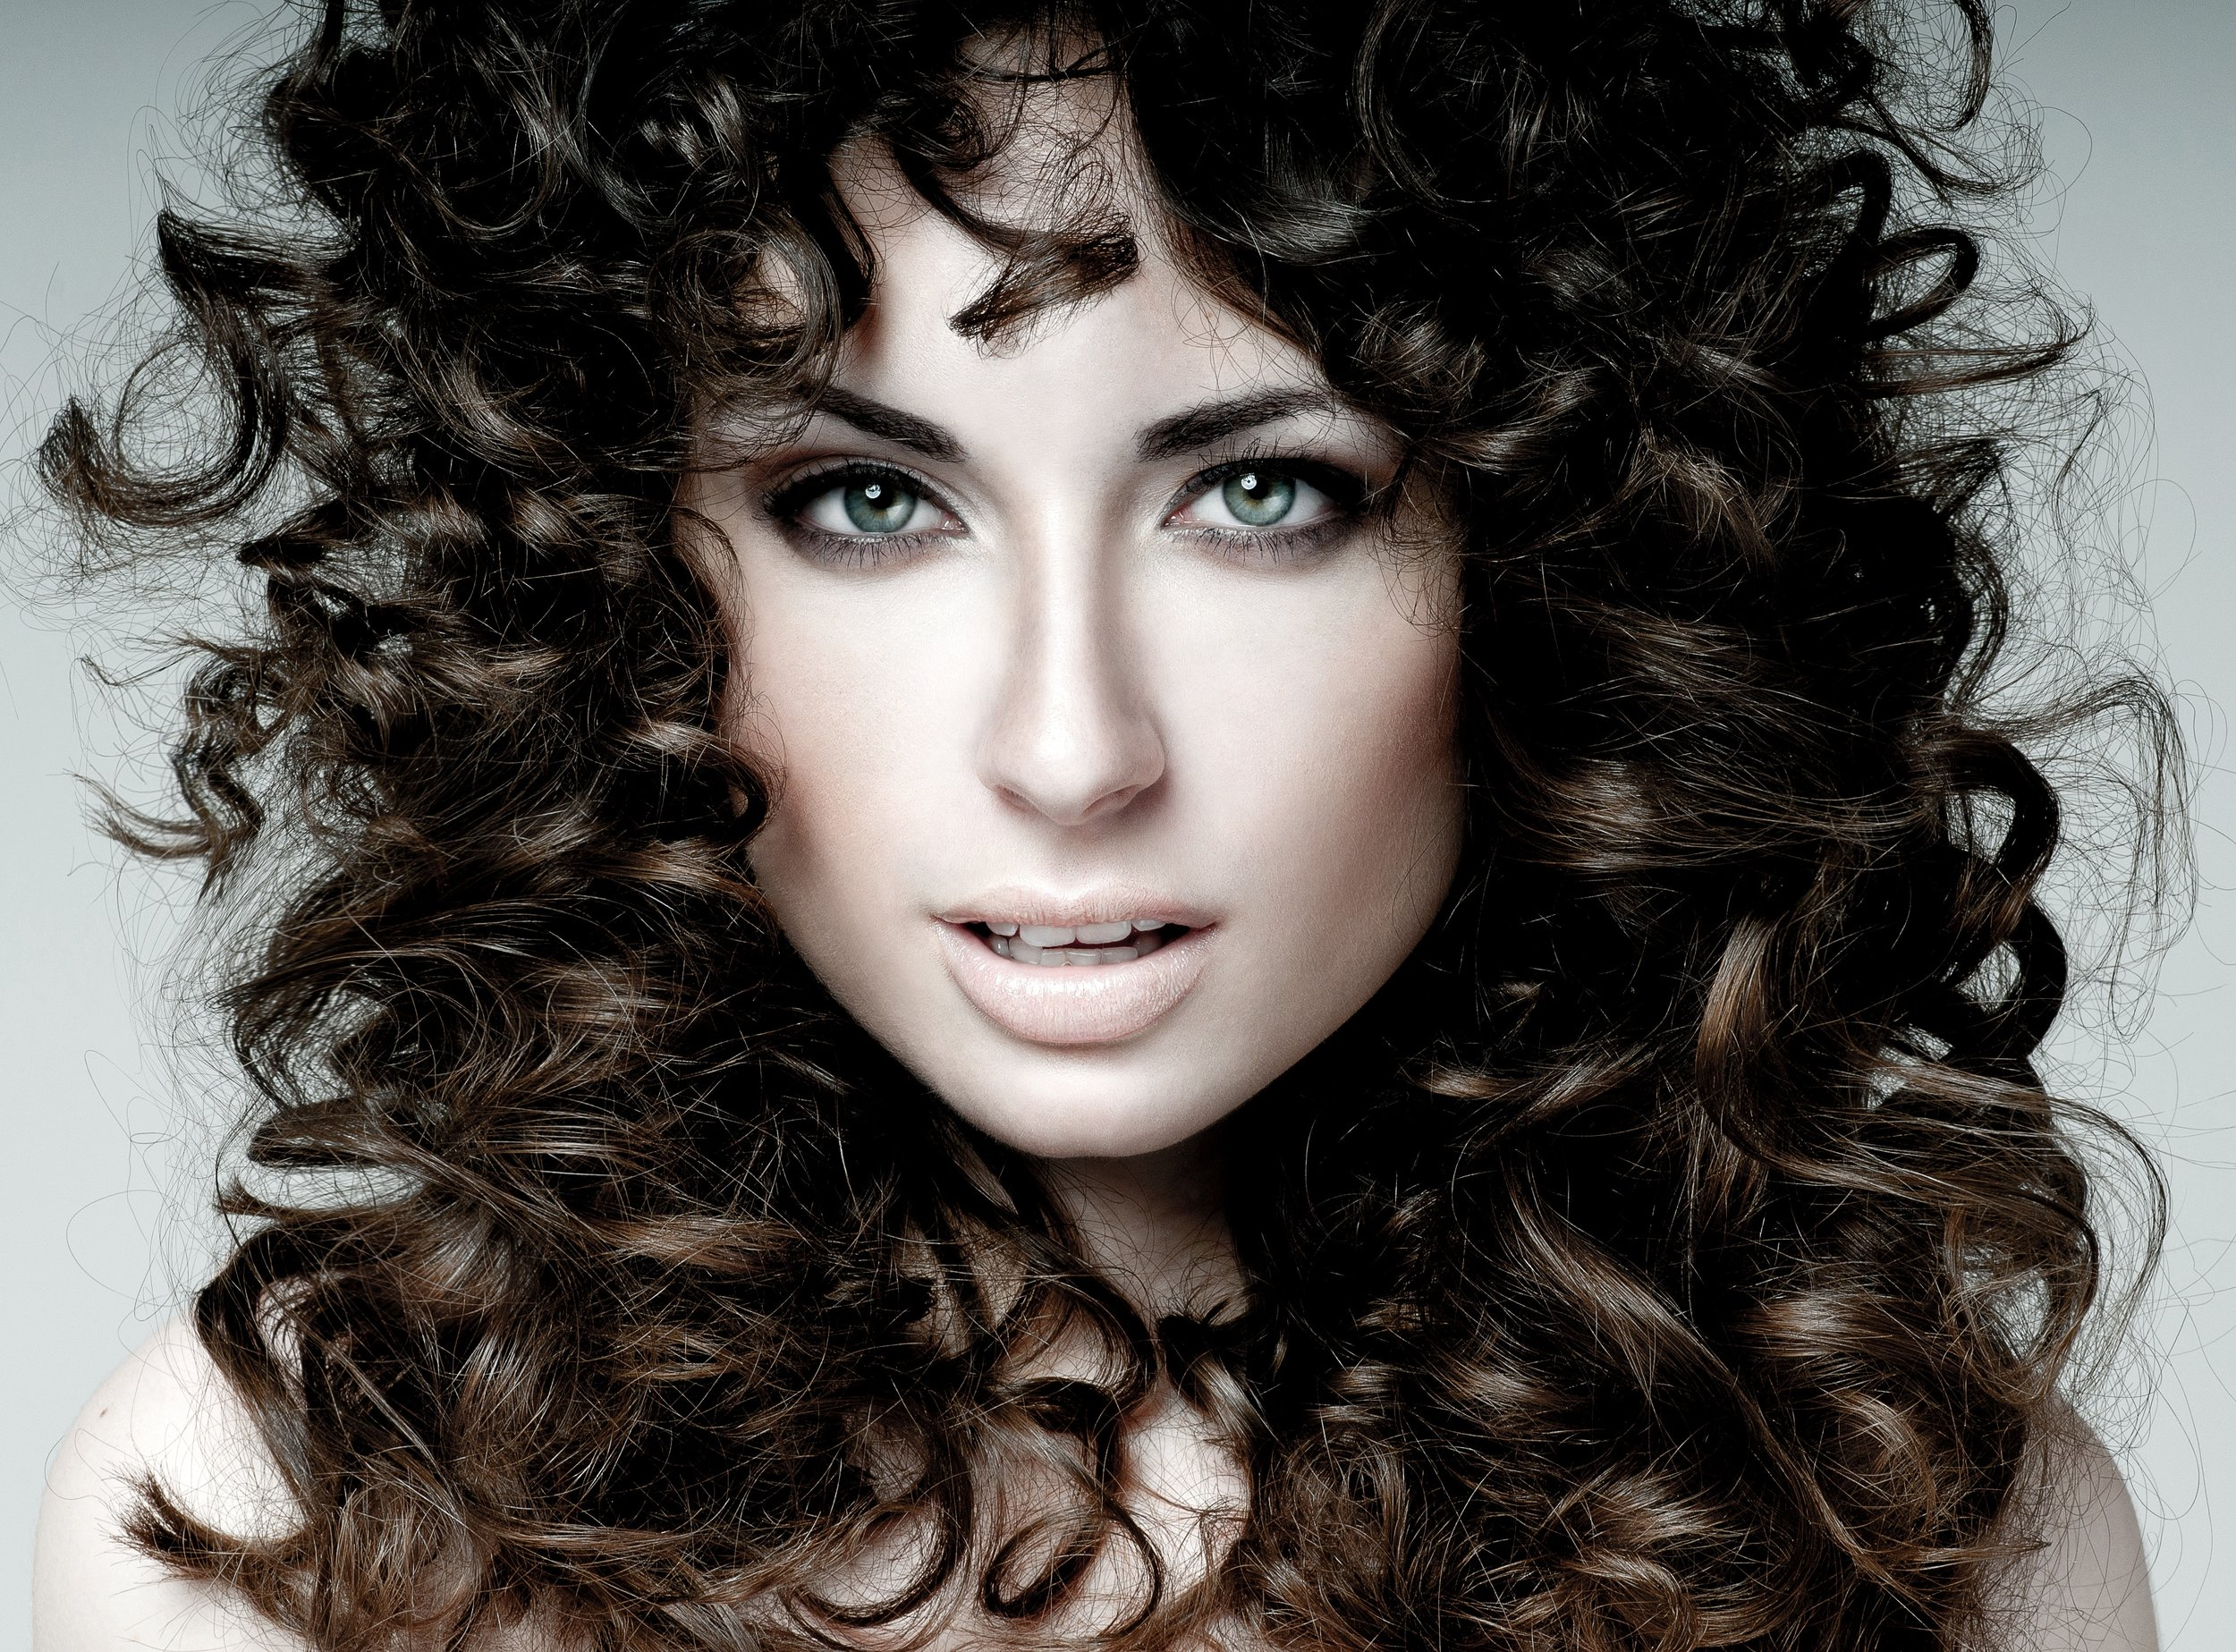 Ouidad Curly Hairstylist Scott Risk Hair Salon